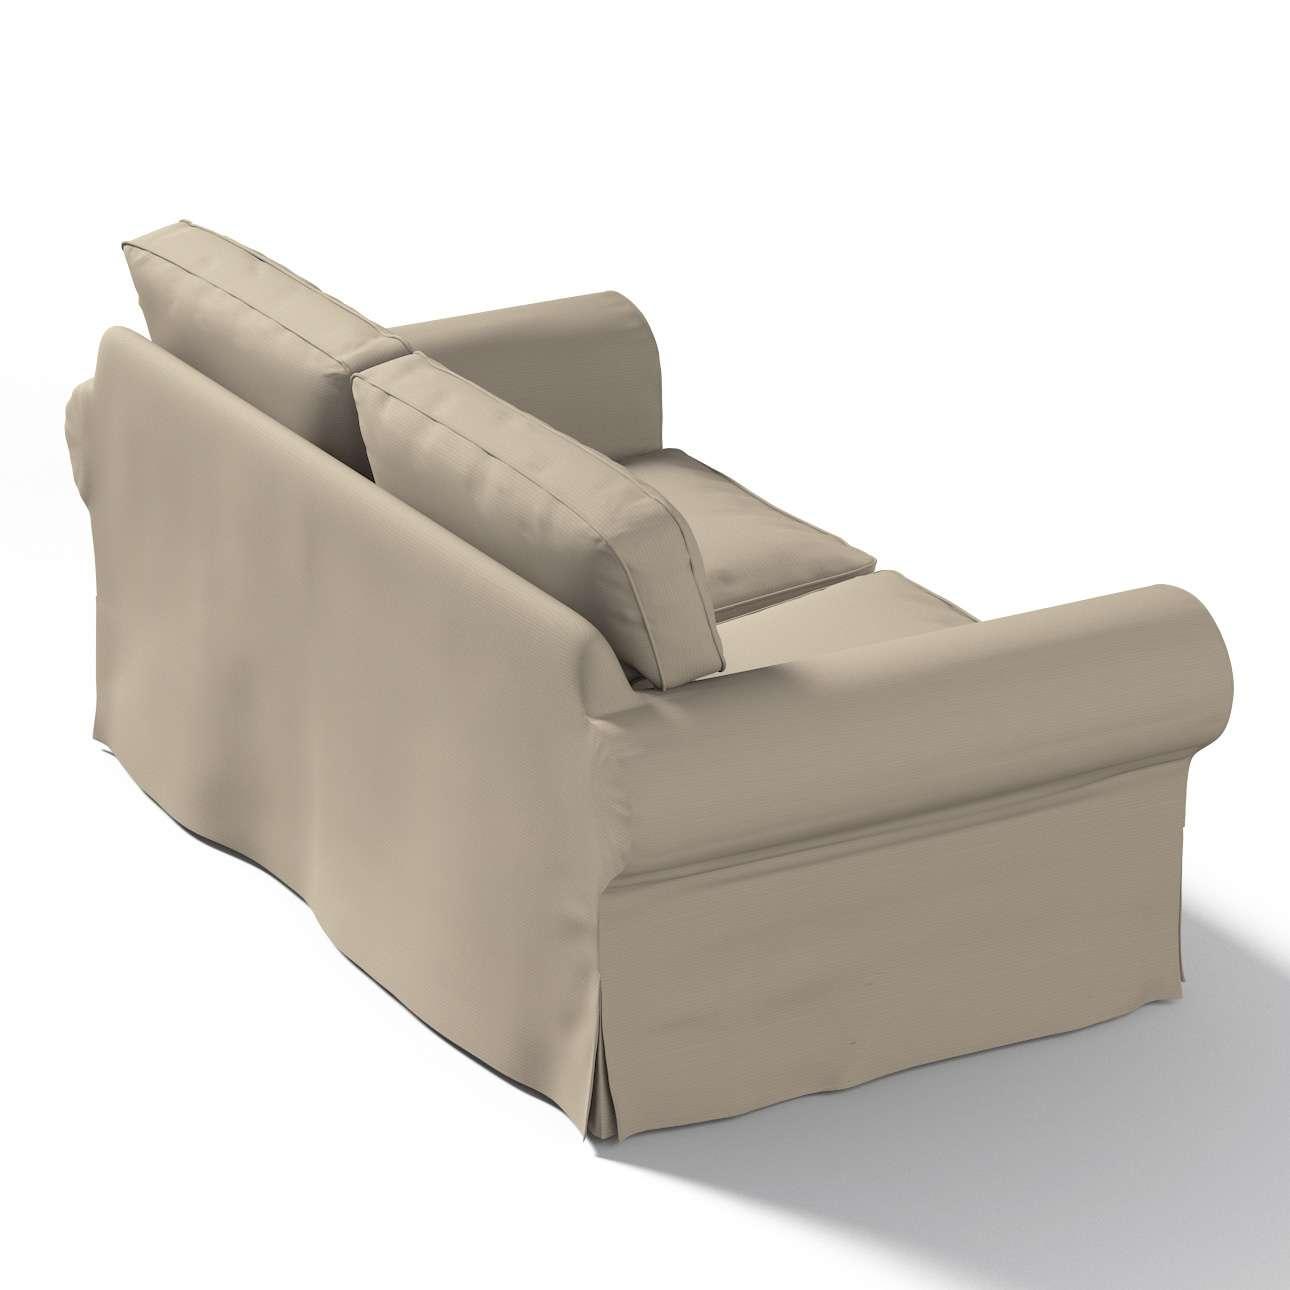 Ektorp 2-Sitzer Schlafsofabezug  ALTES Modell Sofabezug Ektorp 2-Sitzer Schlafsofa altes Modell von der Kollektion Cotton Panama, Stoff: 702-28